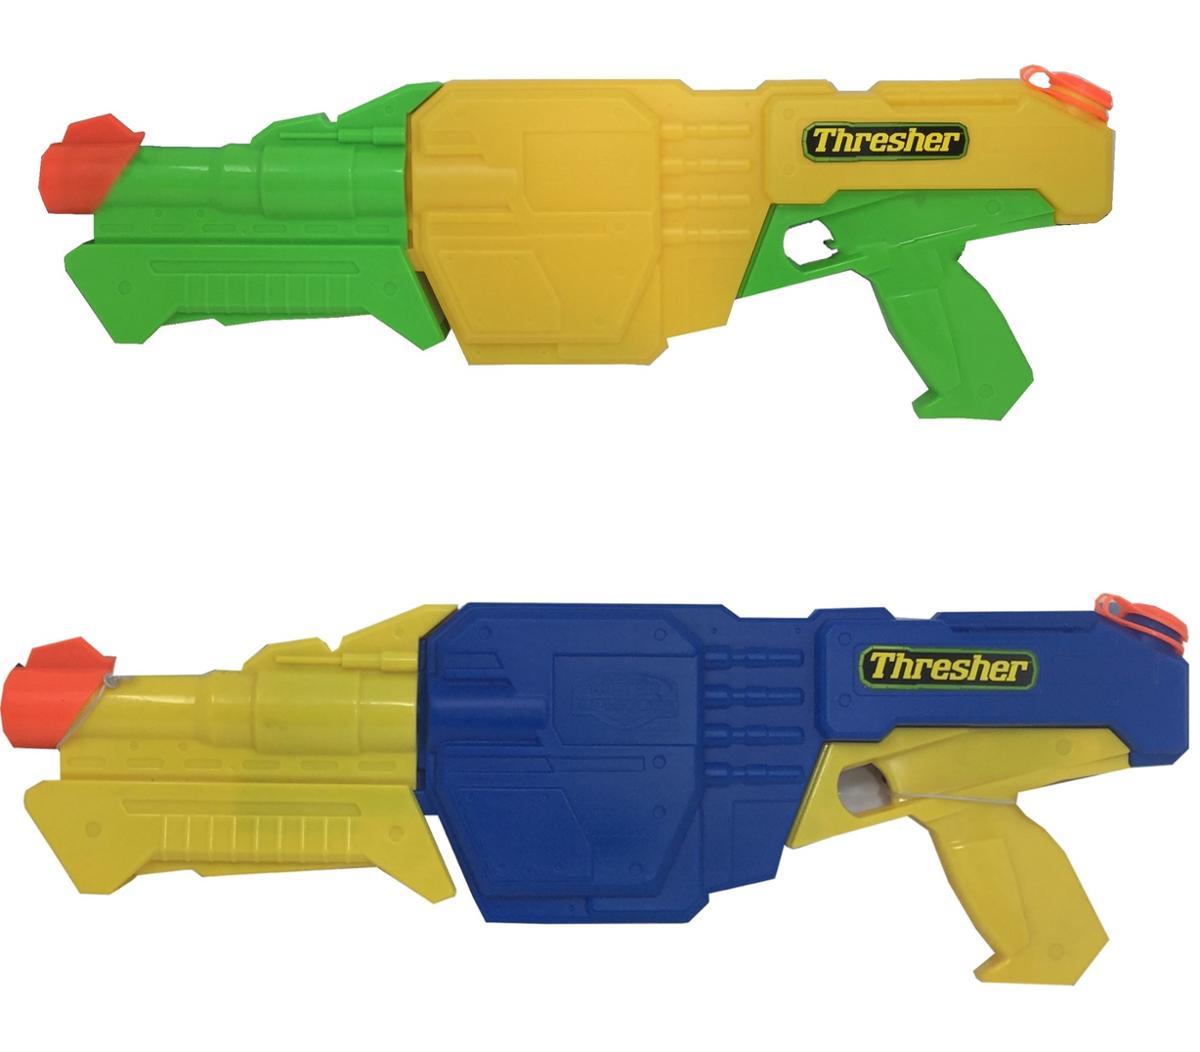 Water Warriors Thresher Water Blaster, Summer Outdoor Water Fun 6 Pack